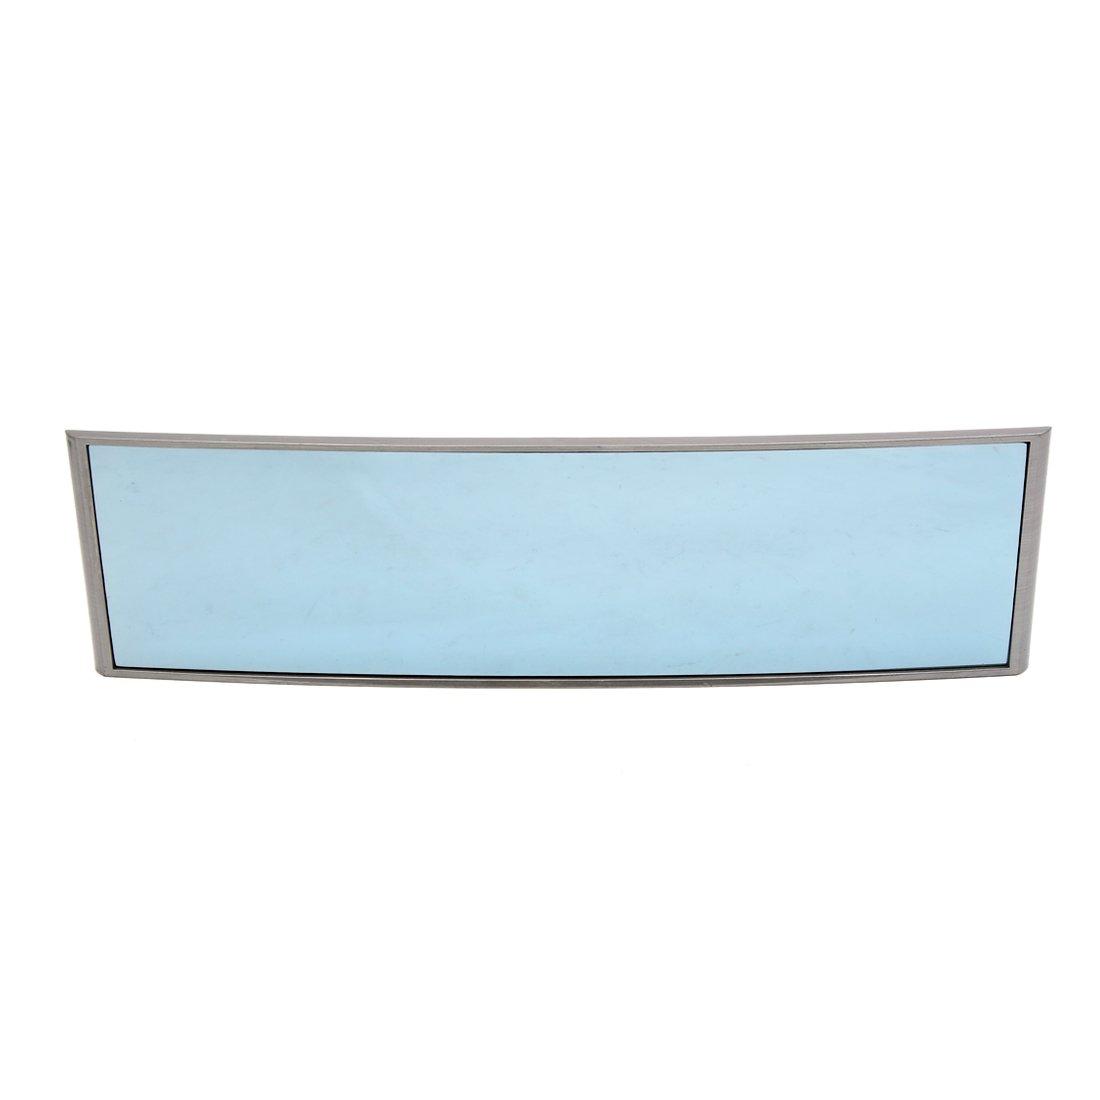 sourcing map 280mm Espejo Curvo Cristal Azul Antideslumbrante Retrovisor Interior de Coche Marco Gris